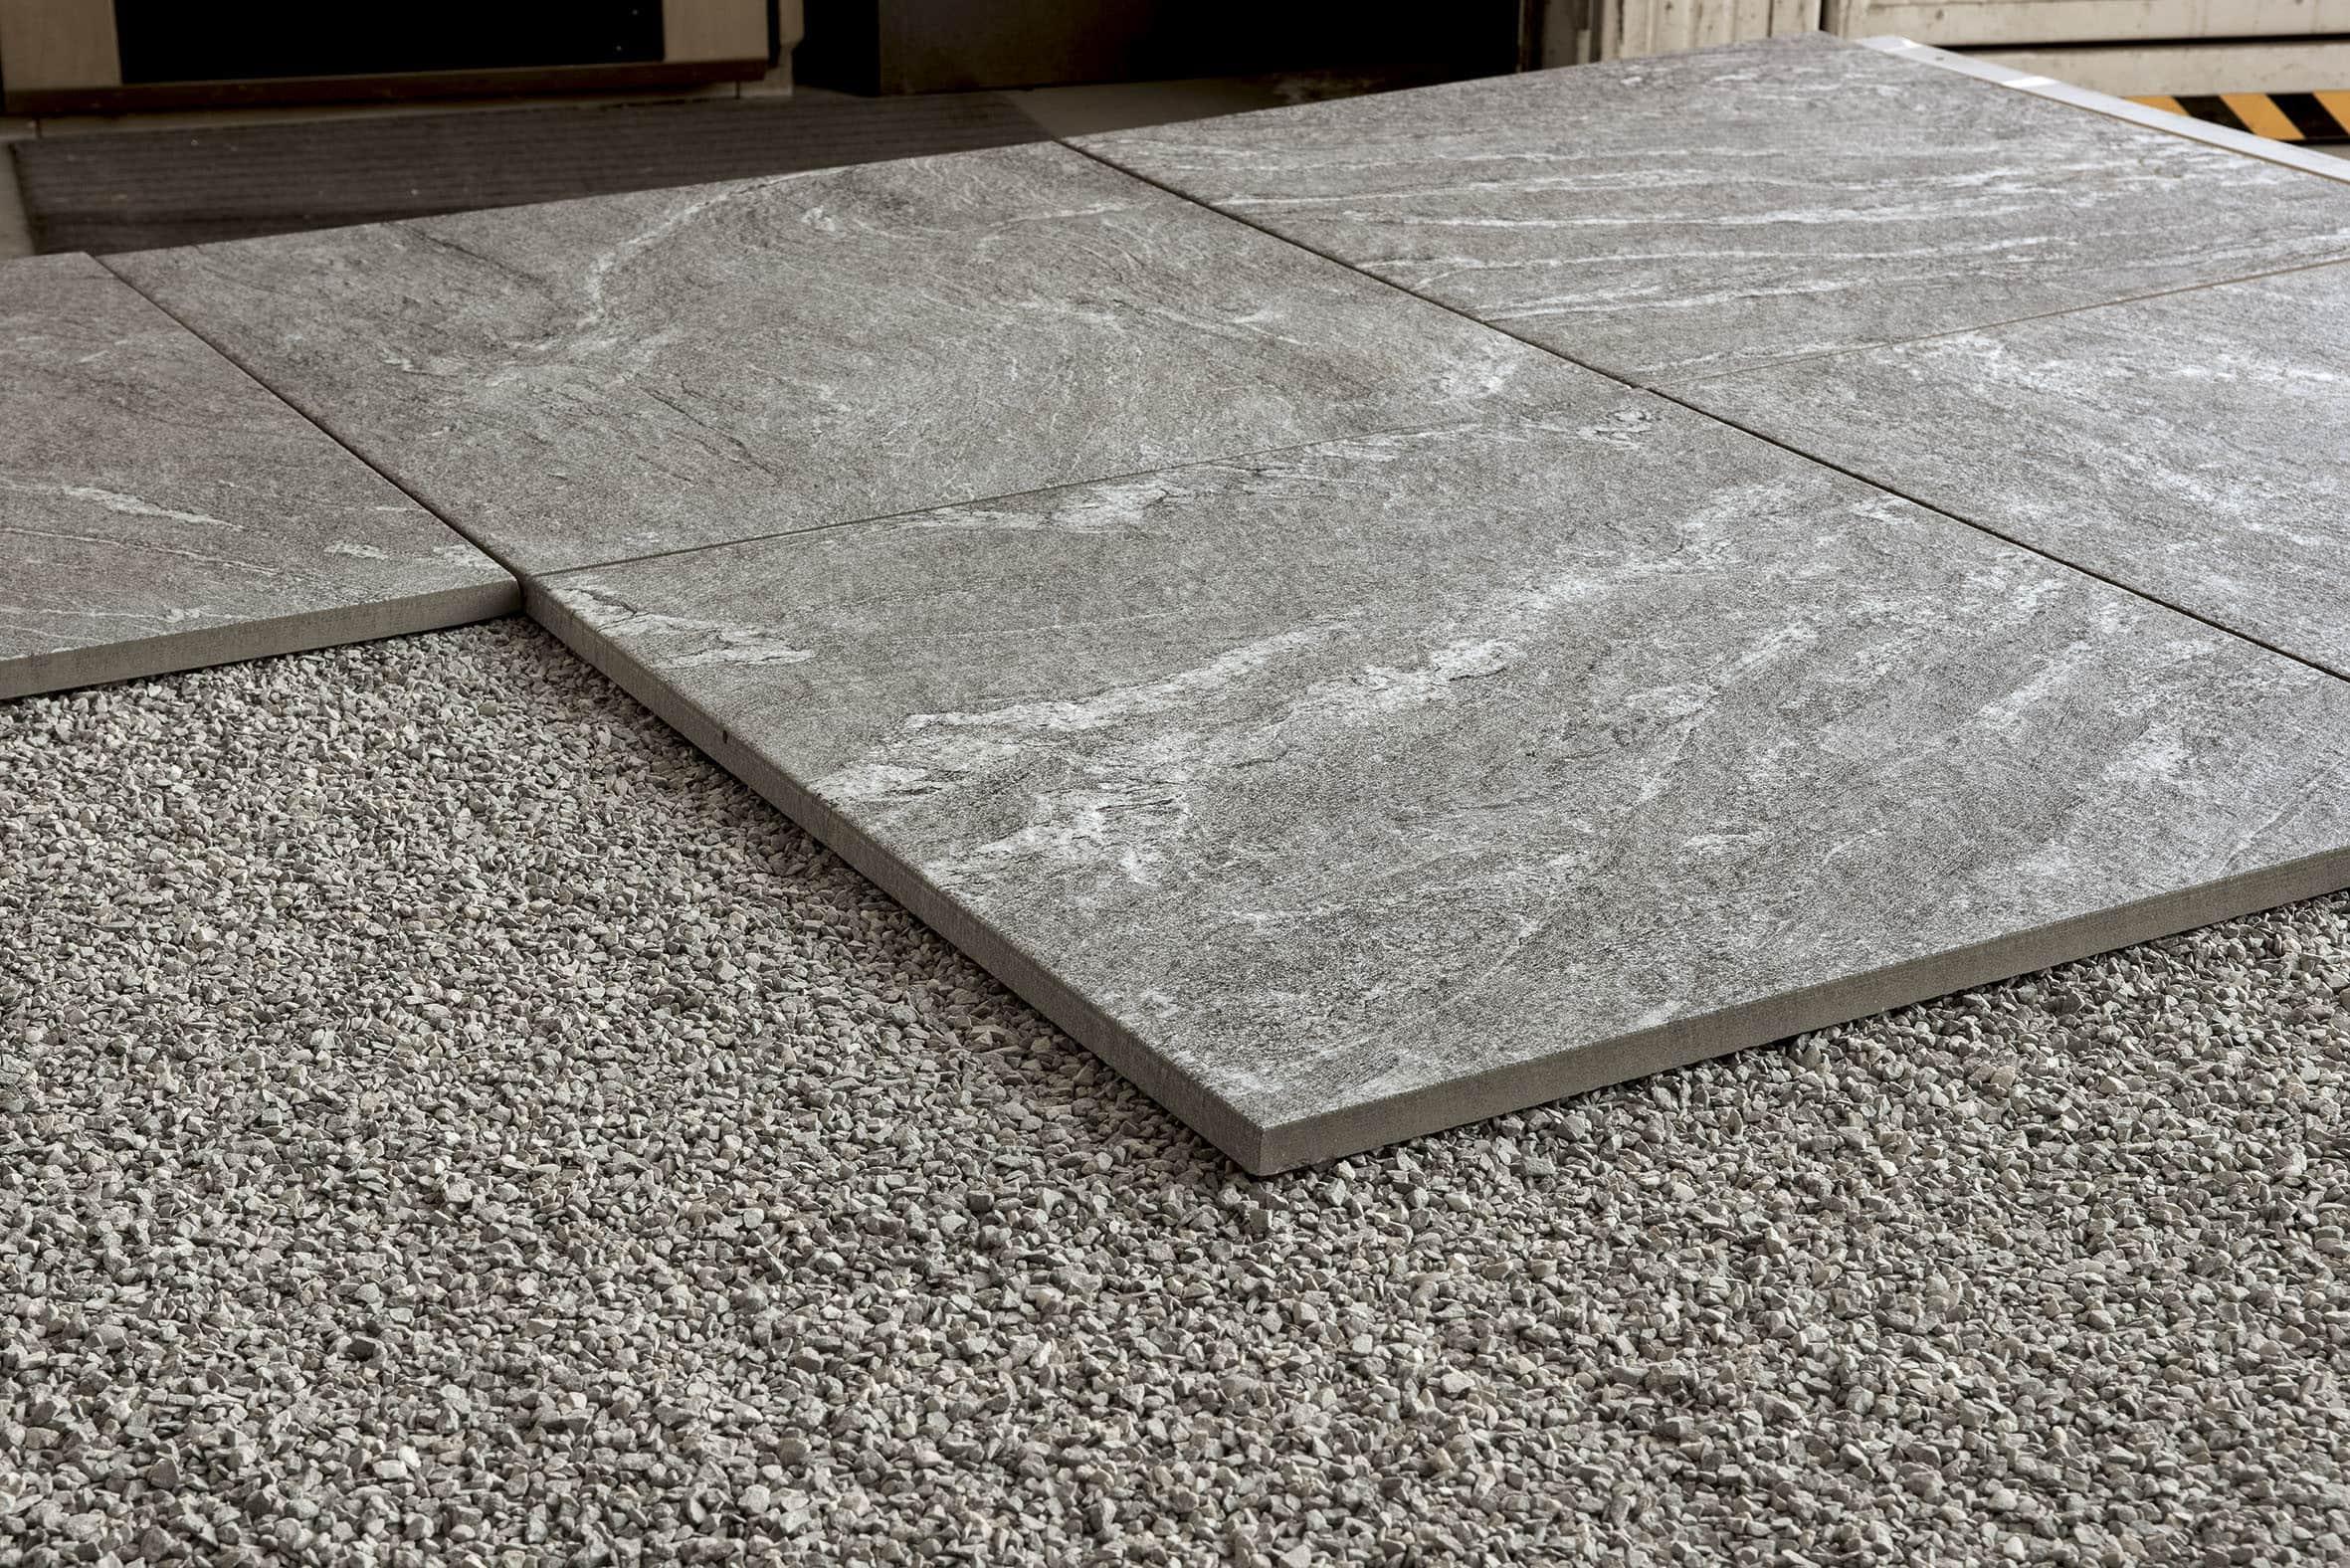 gartenplatten und terrassenplatten trends castratori bkw keramik ag. Black Bedroom Furniture Sets. Home Design Ideas